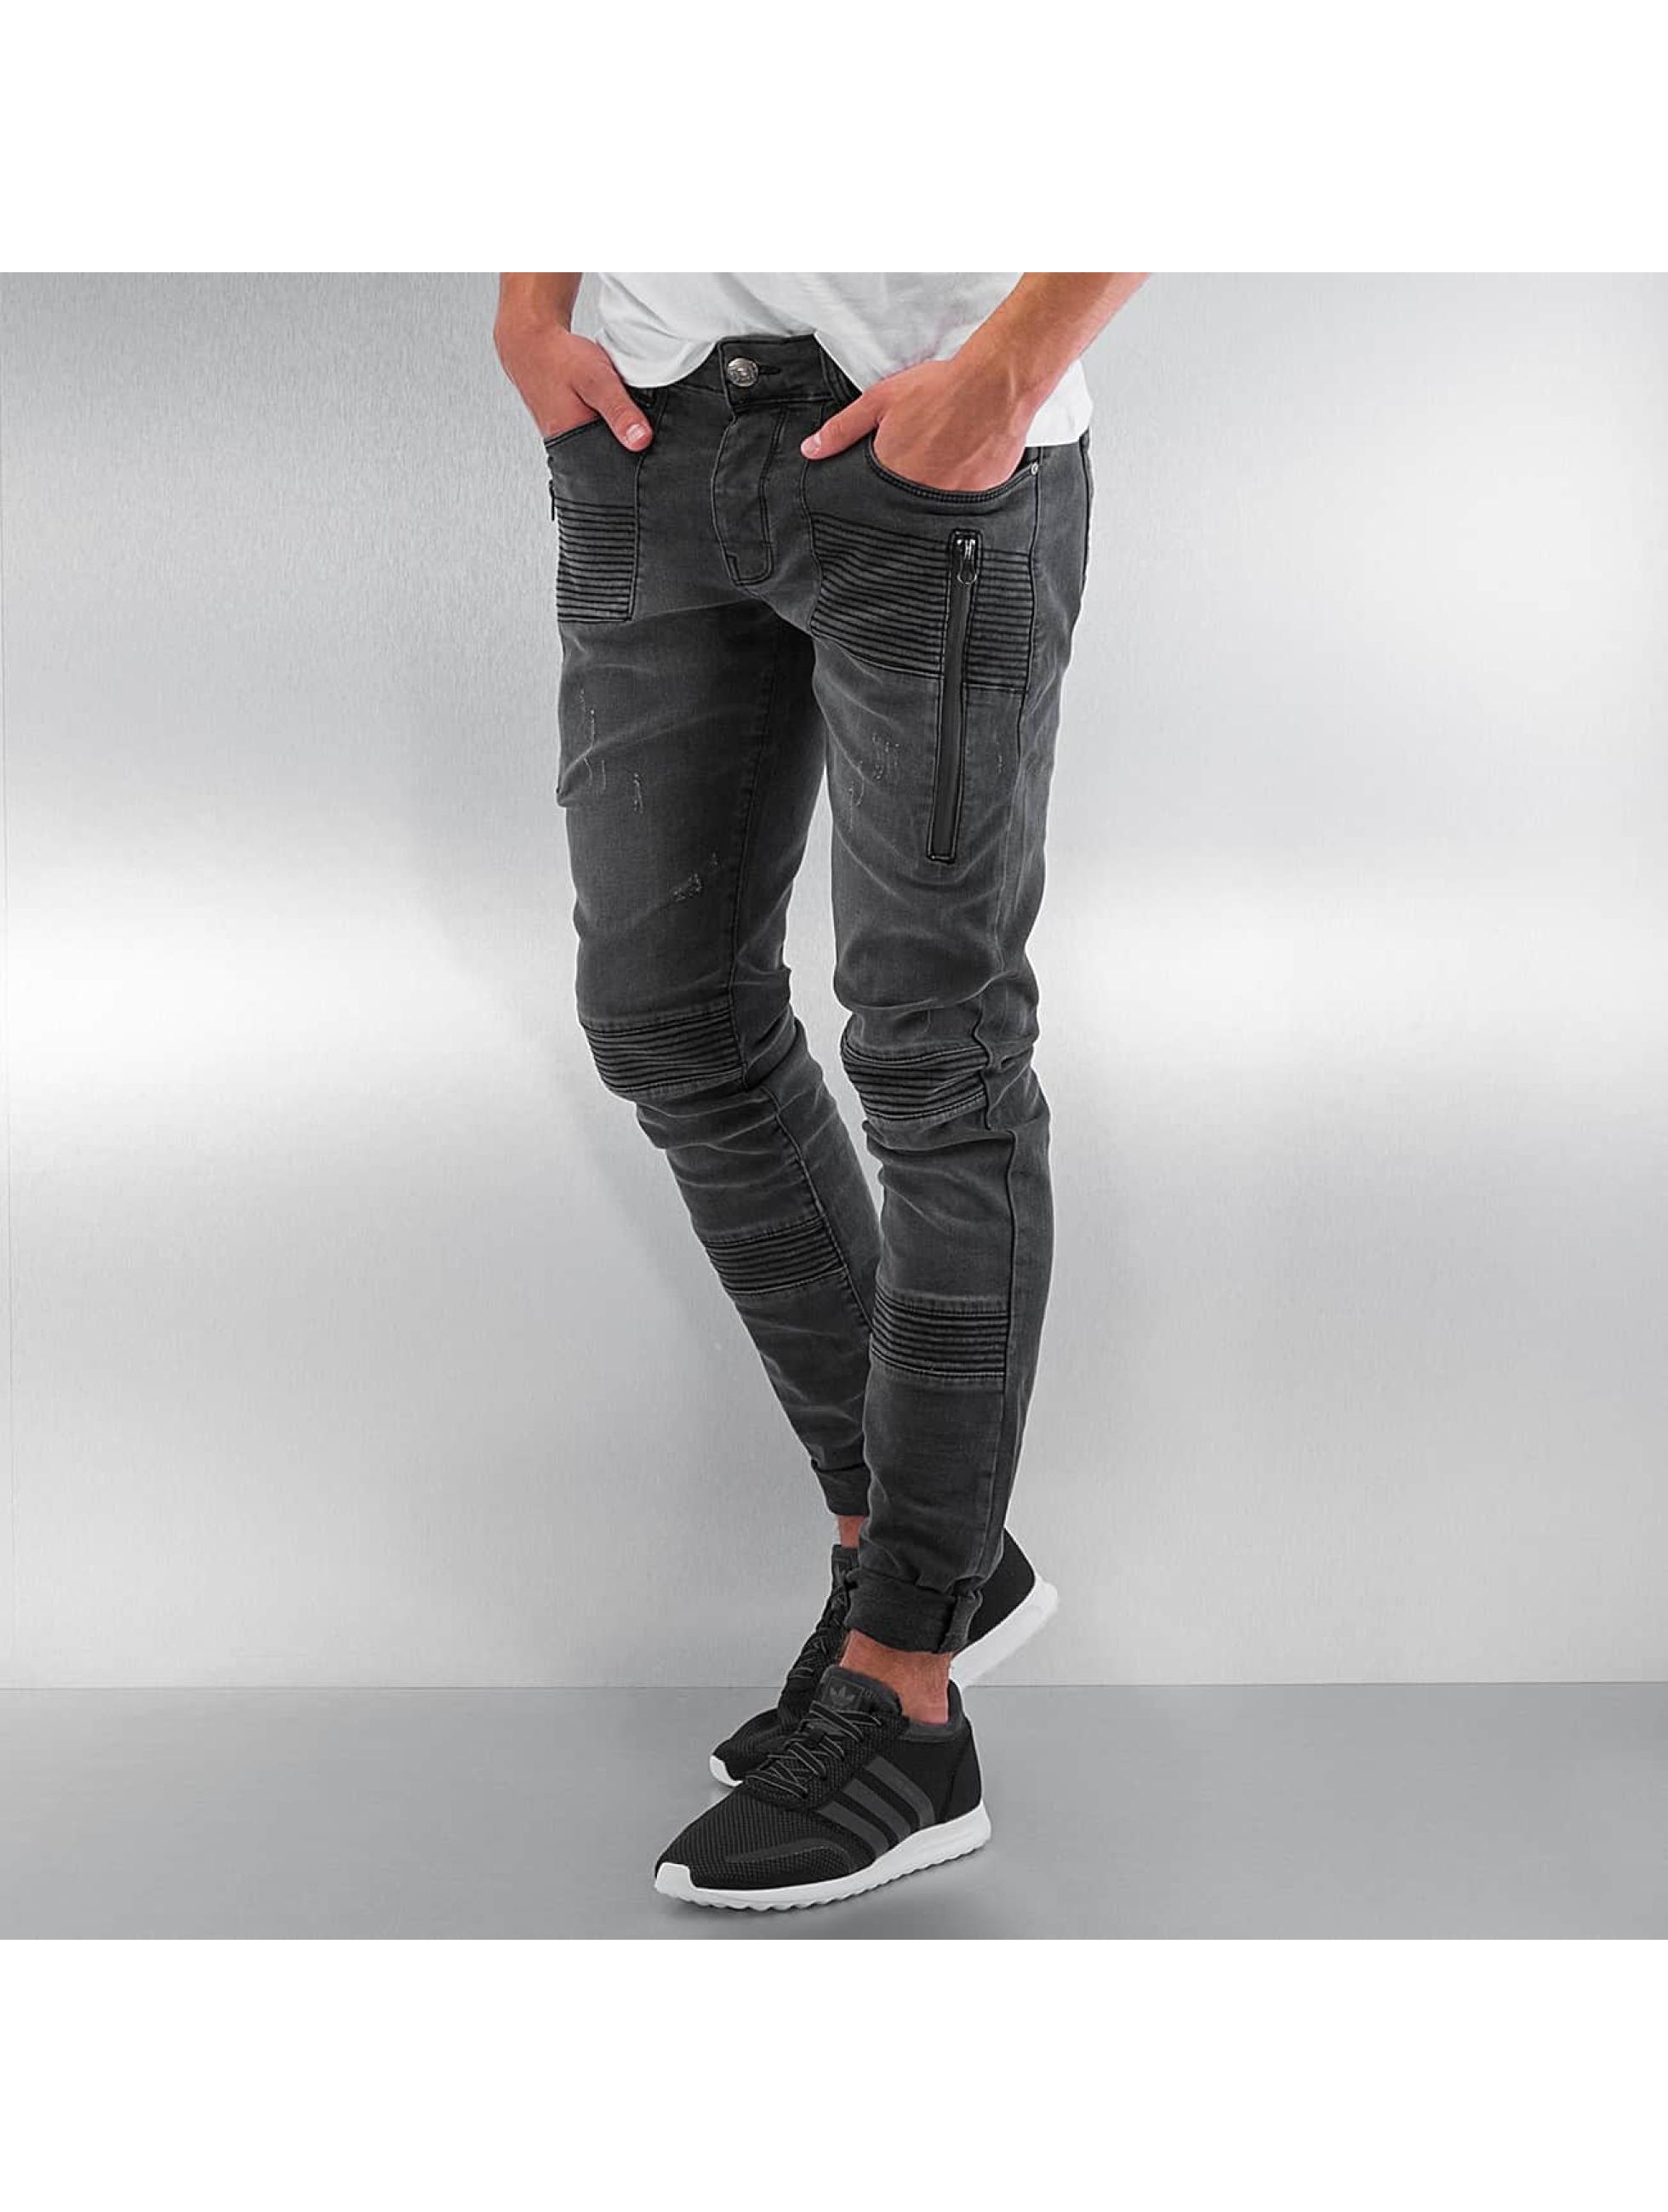 Straight Fit Jeans Berlin in grau